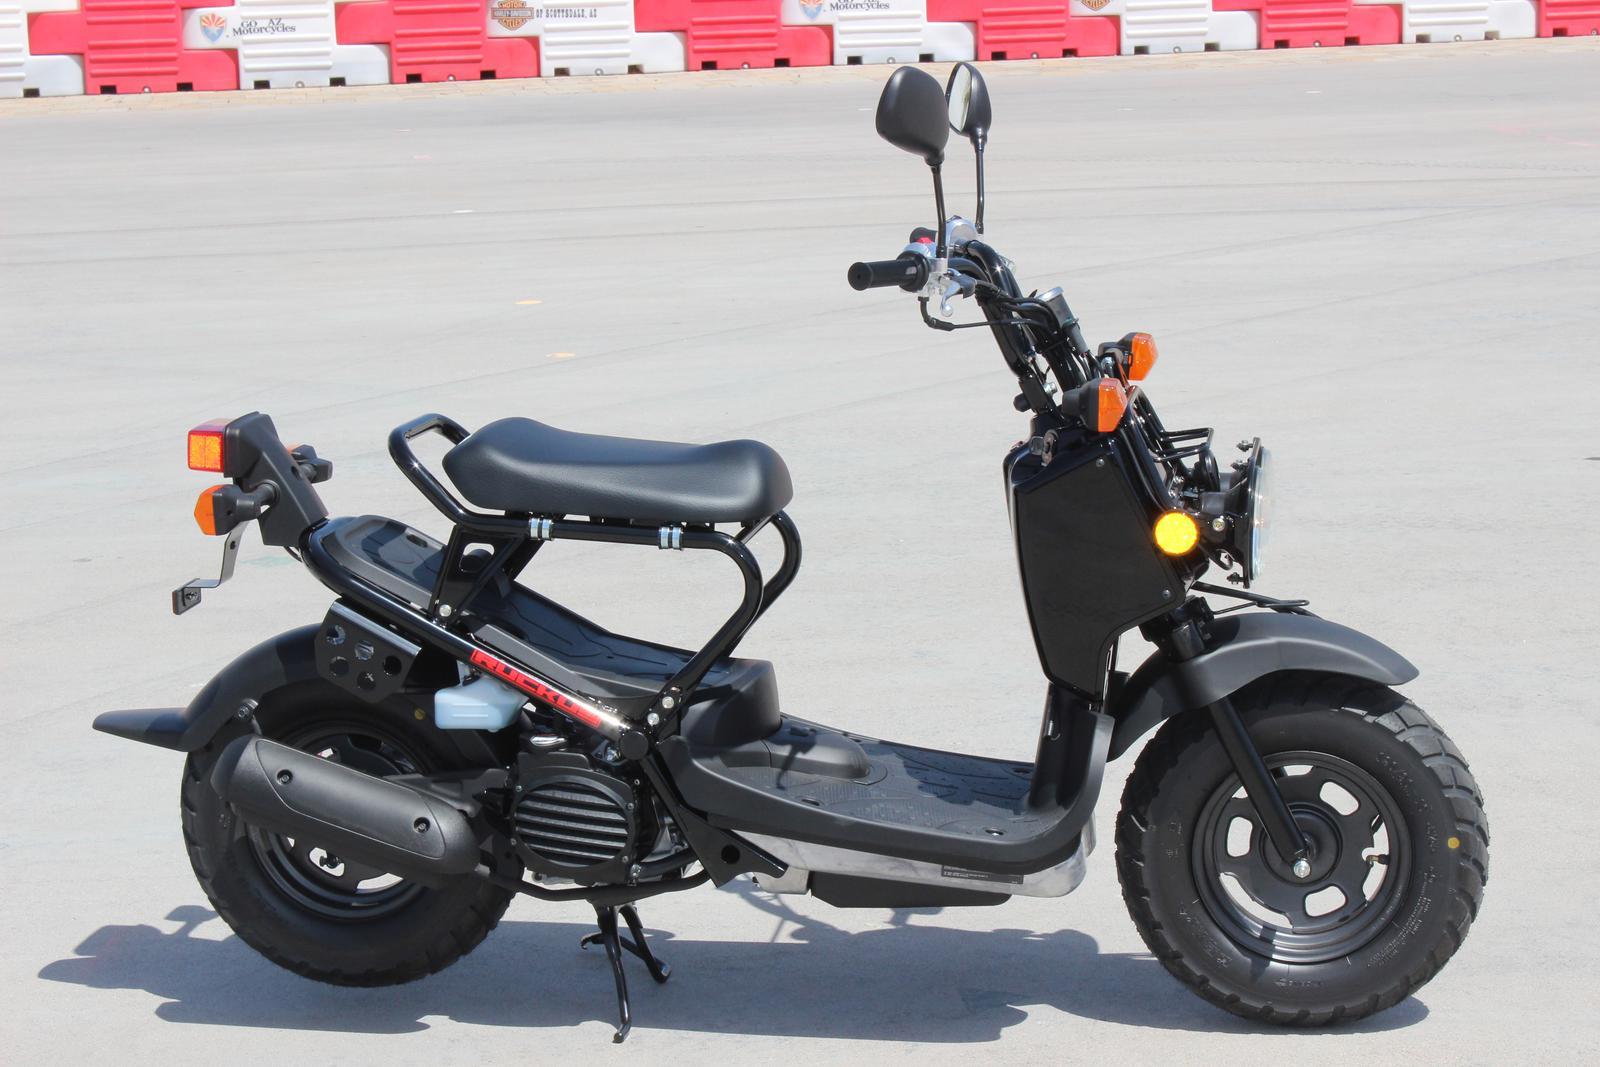 2017 honda ruckus for sale in scottsdale, az | go az motorcycles